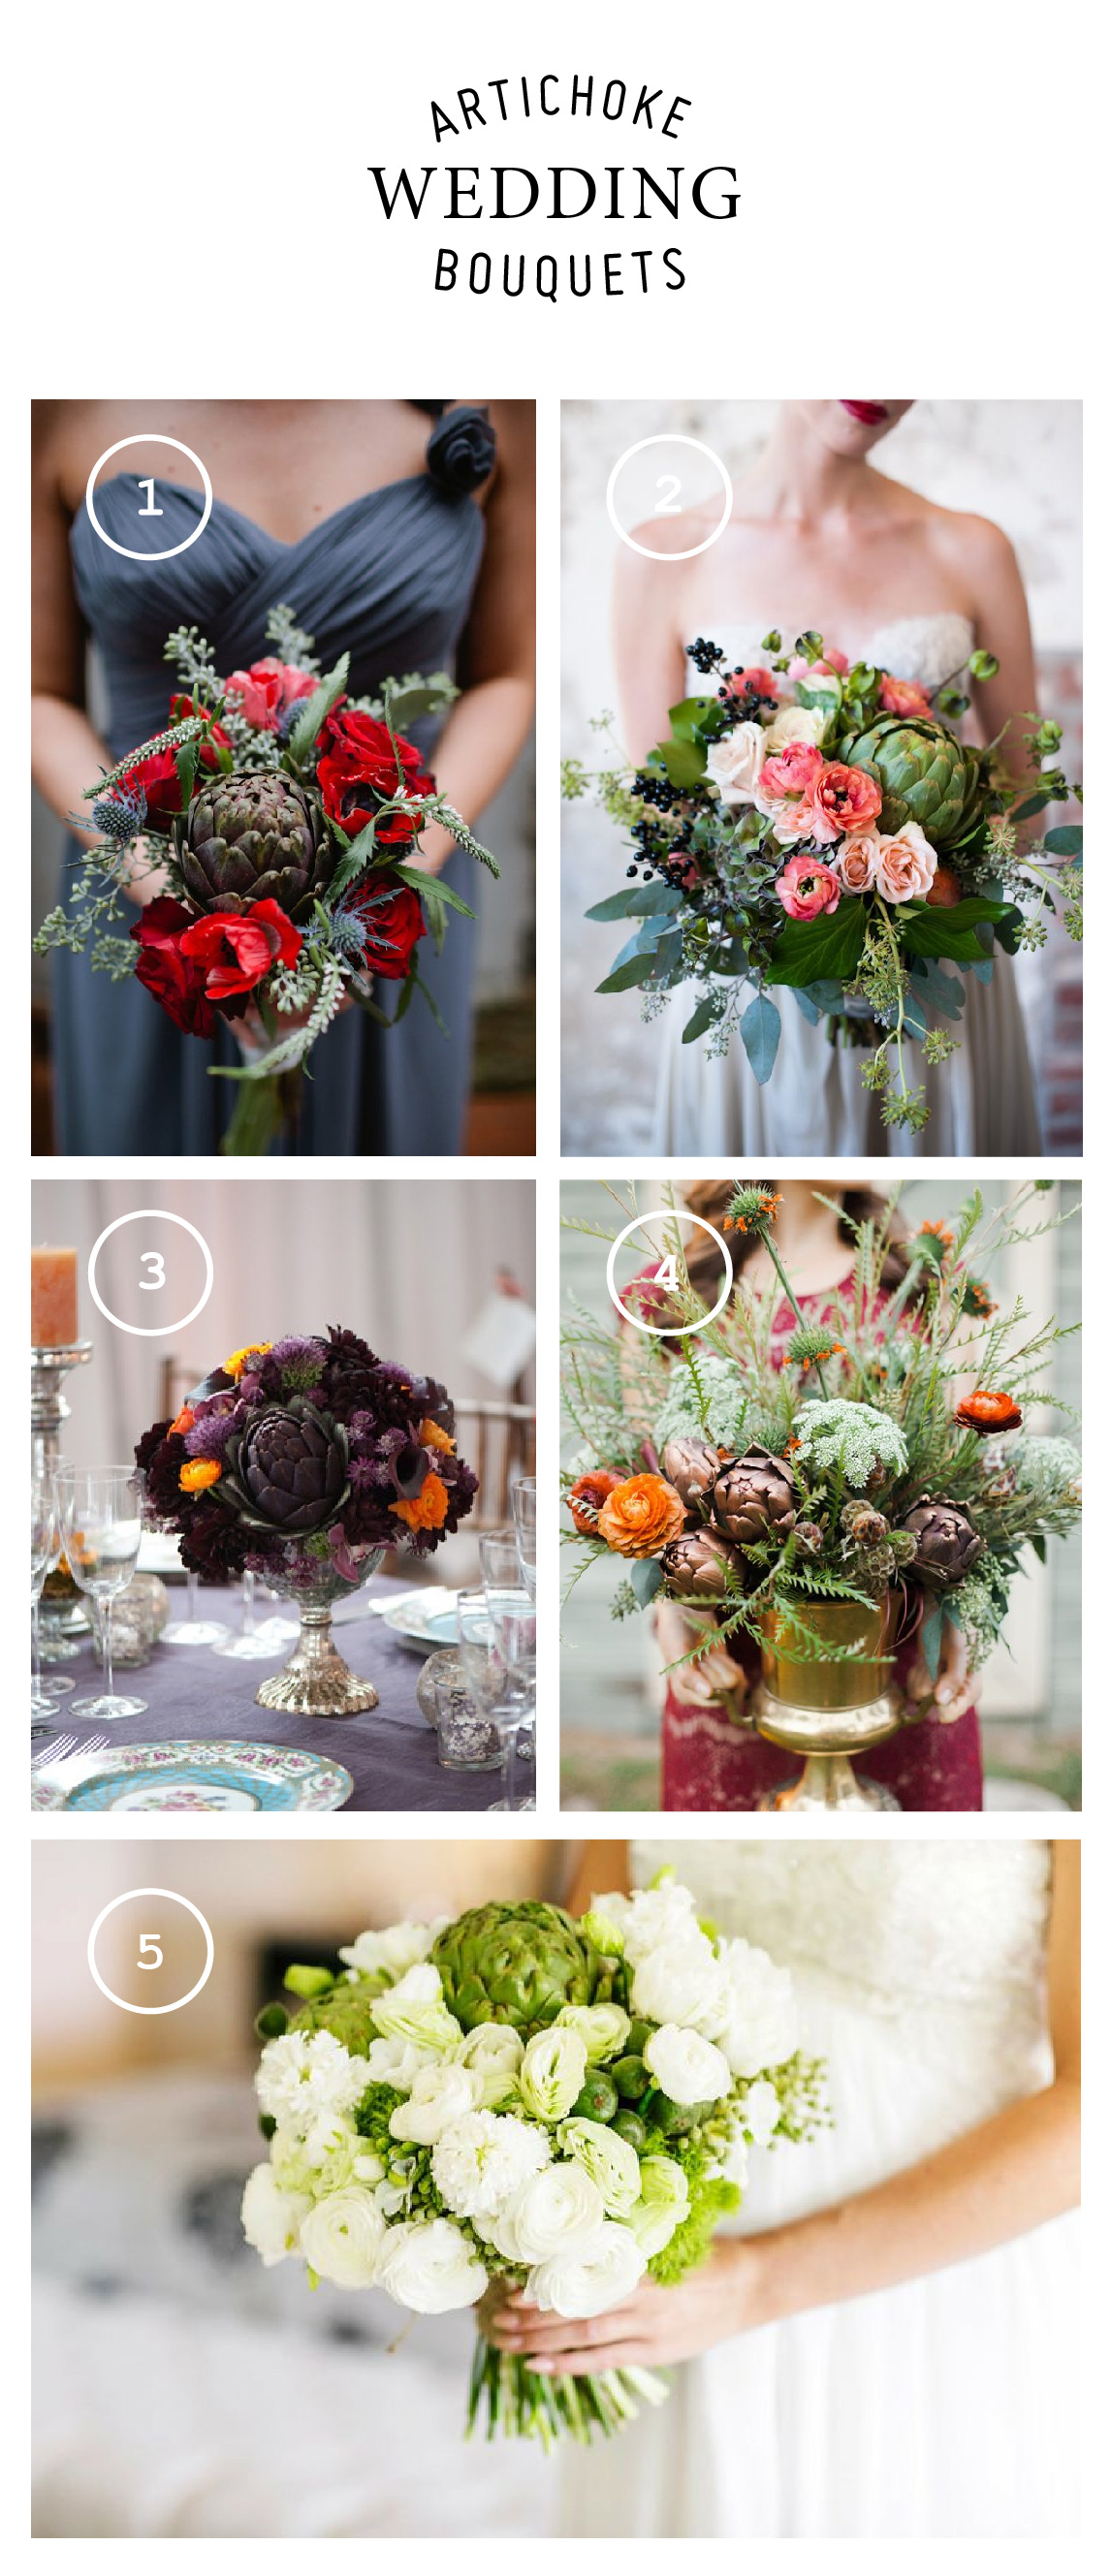 artichokes in wedding bouquets